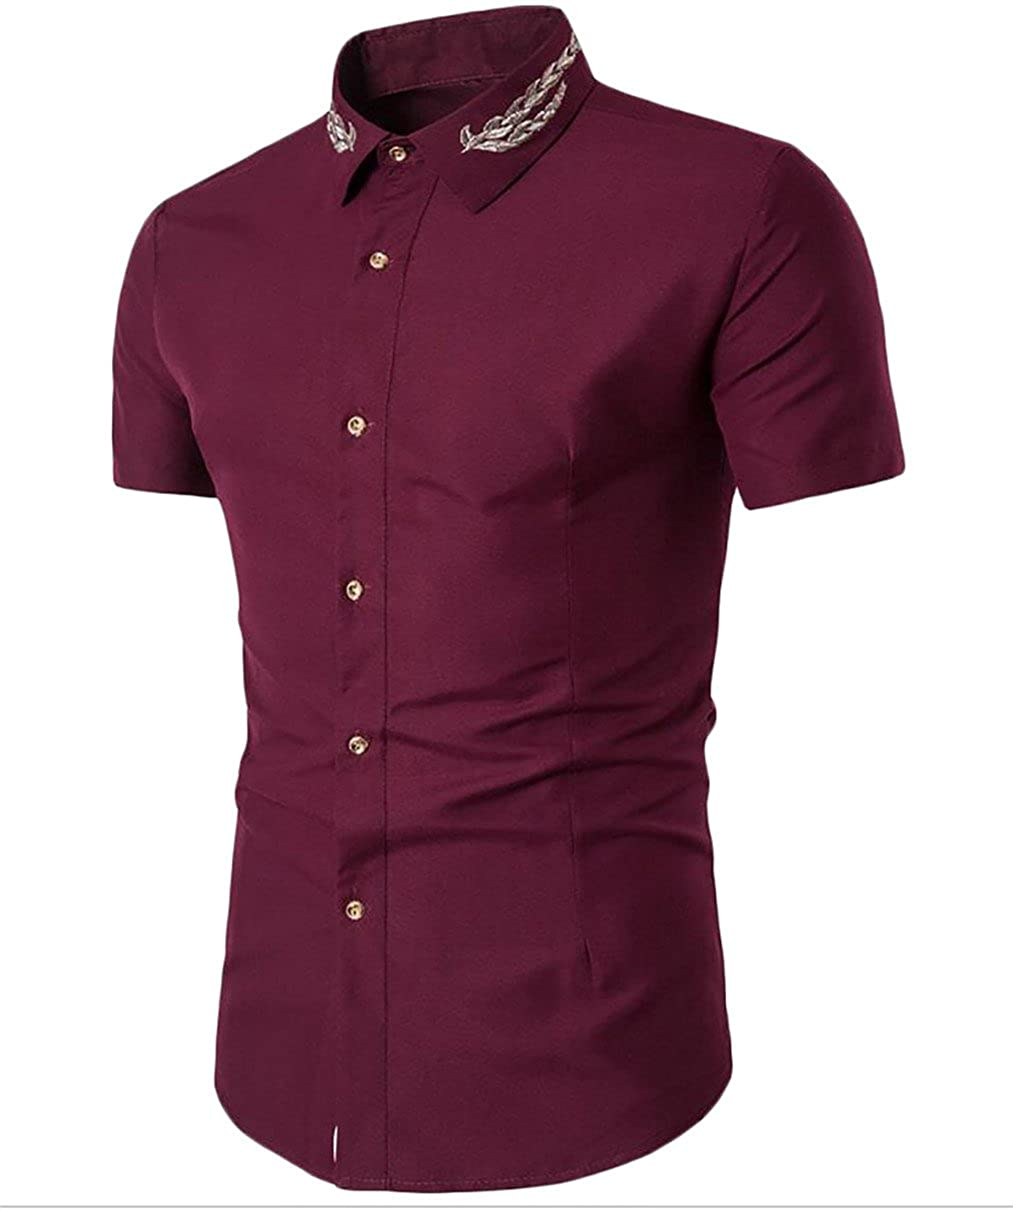 Qiangjinjiu Mens Short Sleeve Turn Down Collar Fashional Solid-Colored Slim Fitted Shirt